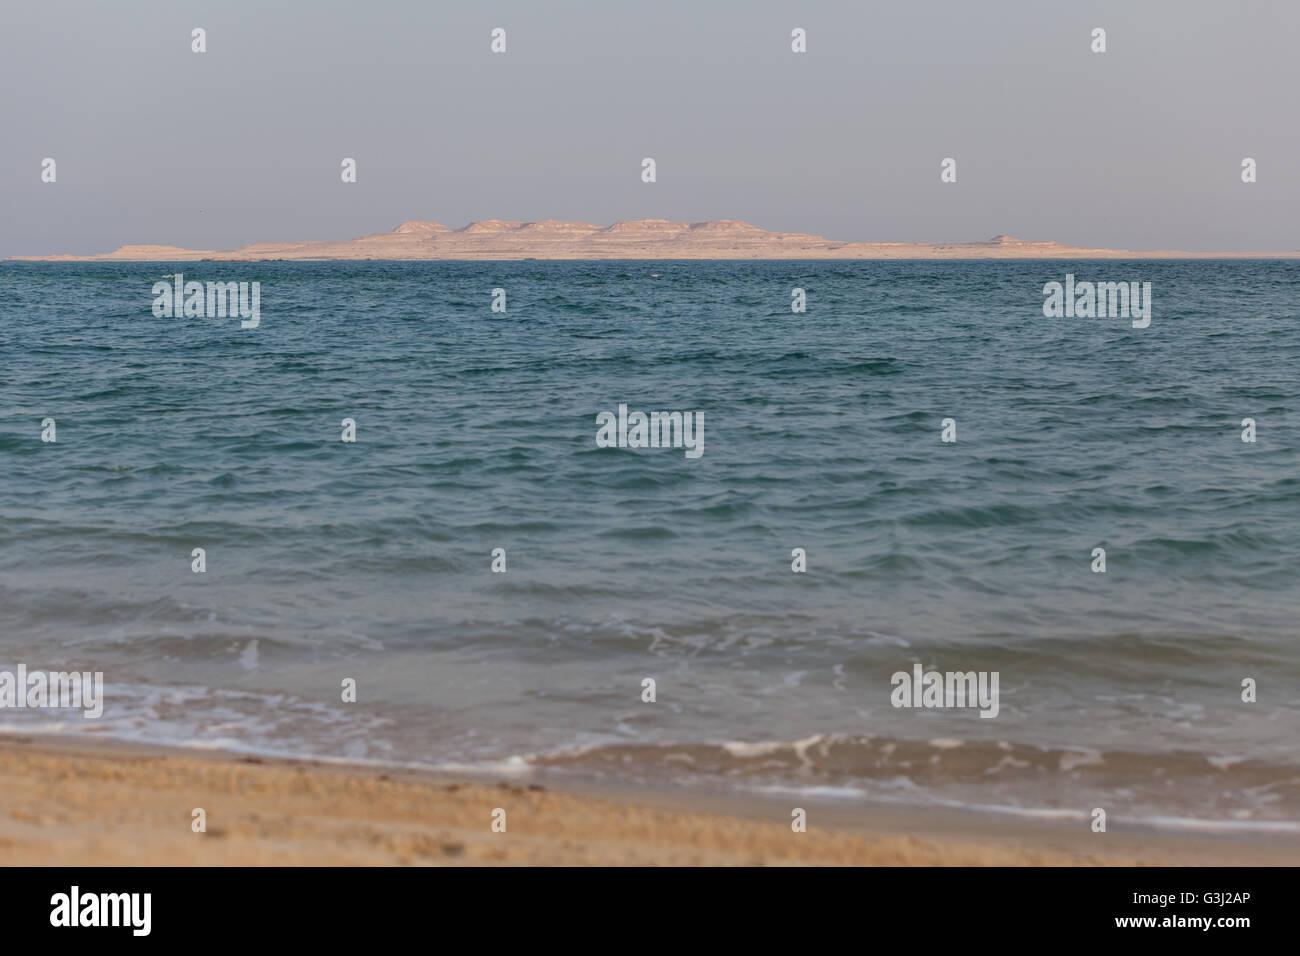 The coast of Saudi Arabia viewed from the Qatar coast across the inland sea. - Stock Image